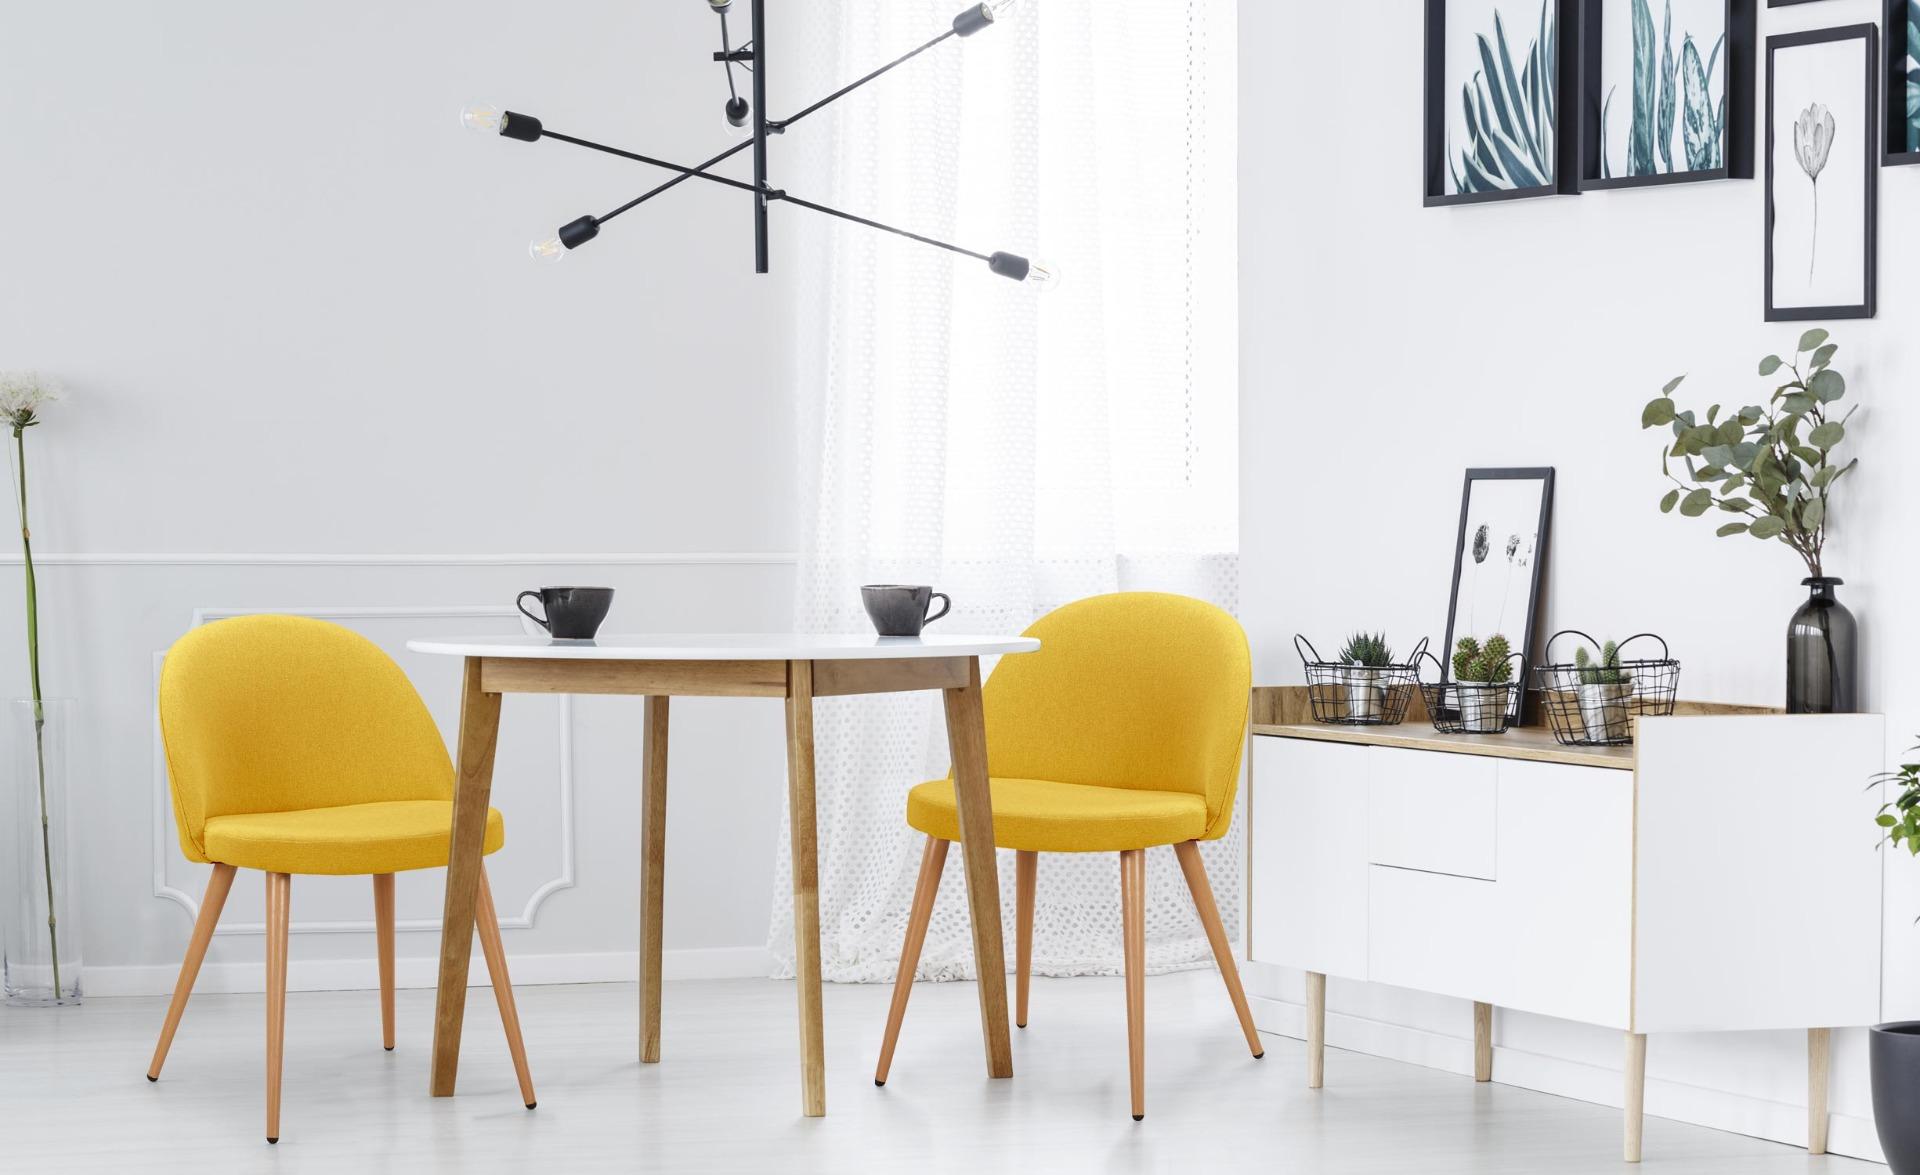 Set di 4 sedie scandinave Maury in tessuto giallo